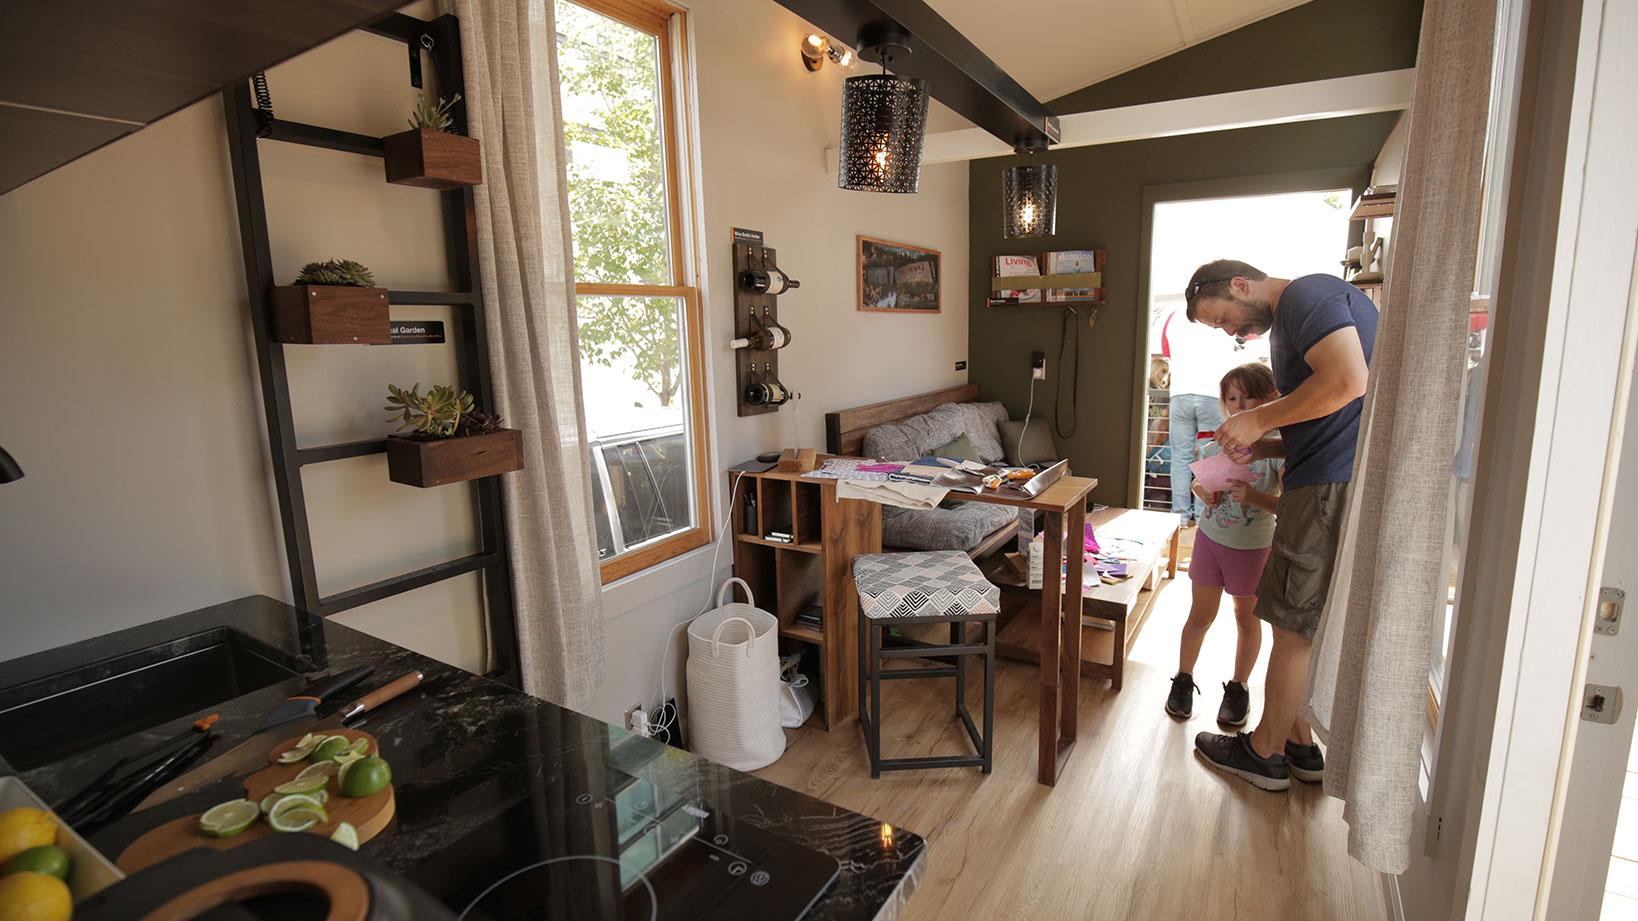 Fiskars Tiny home - Design and Custom Fabrication